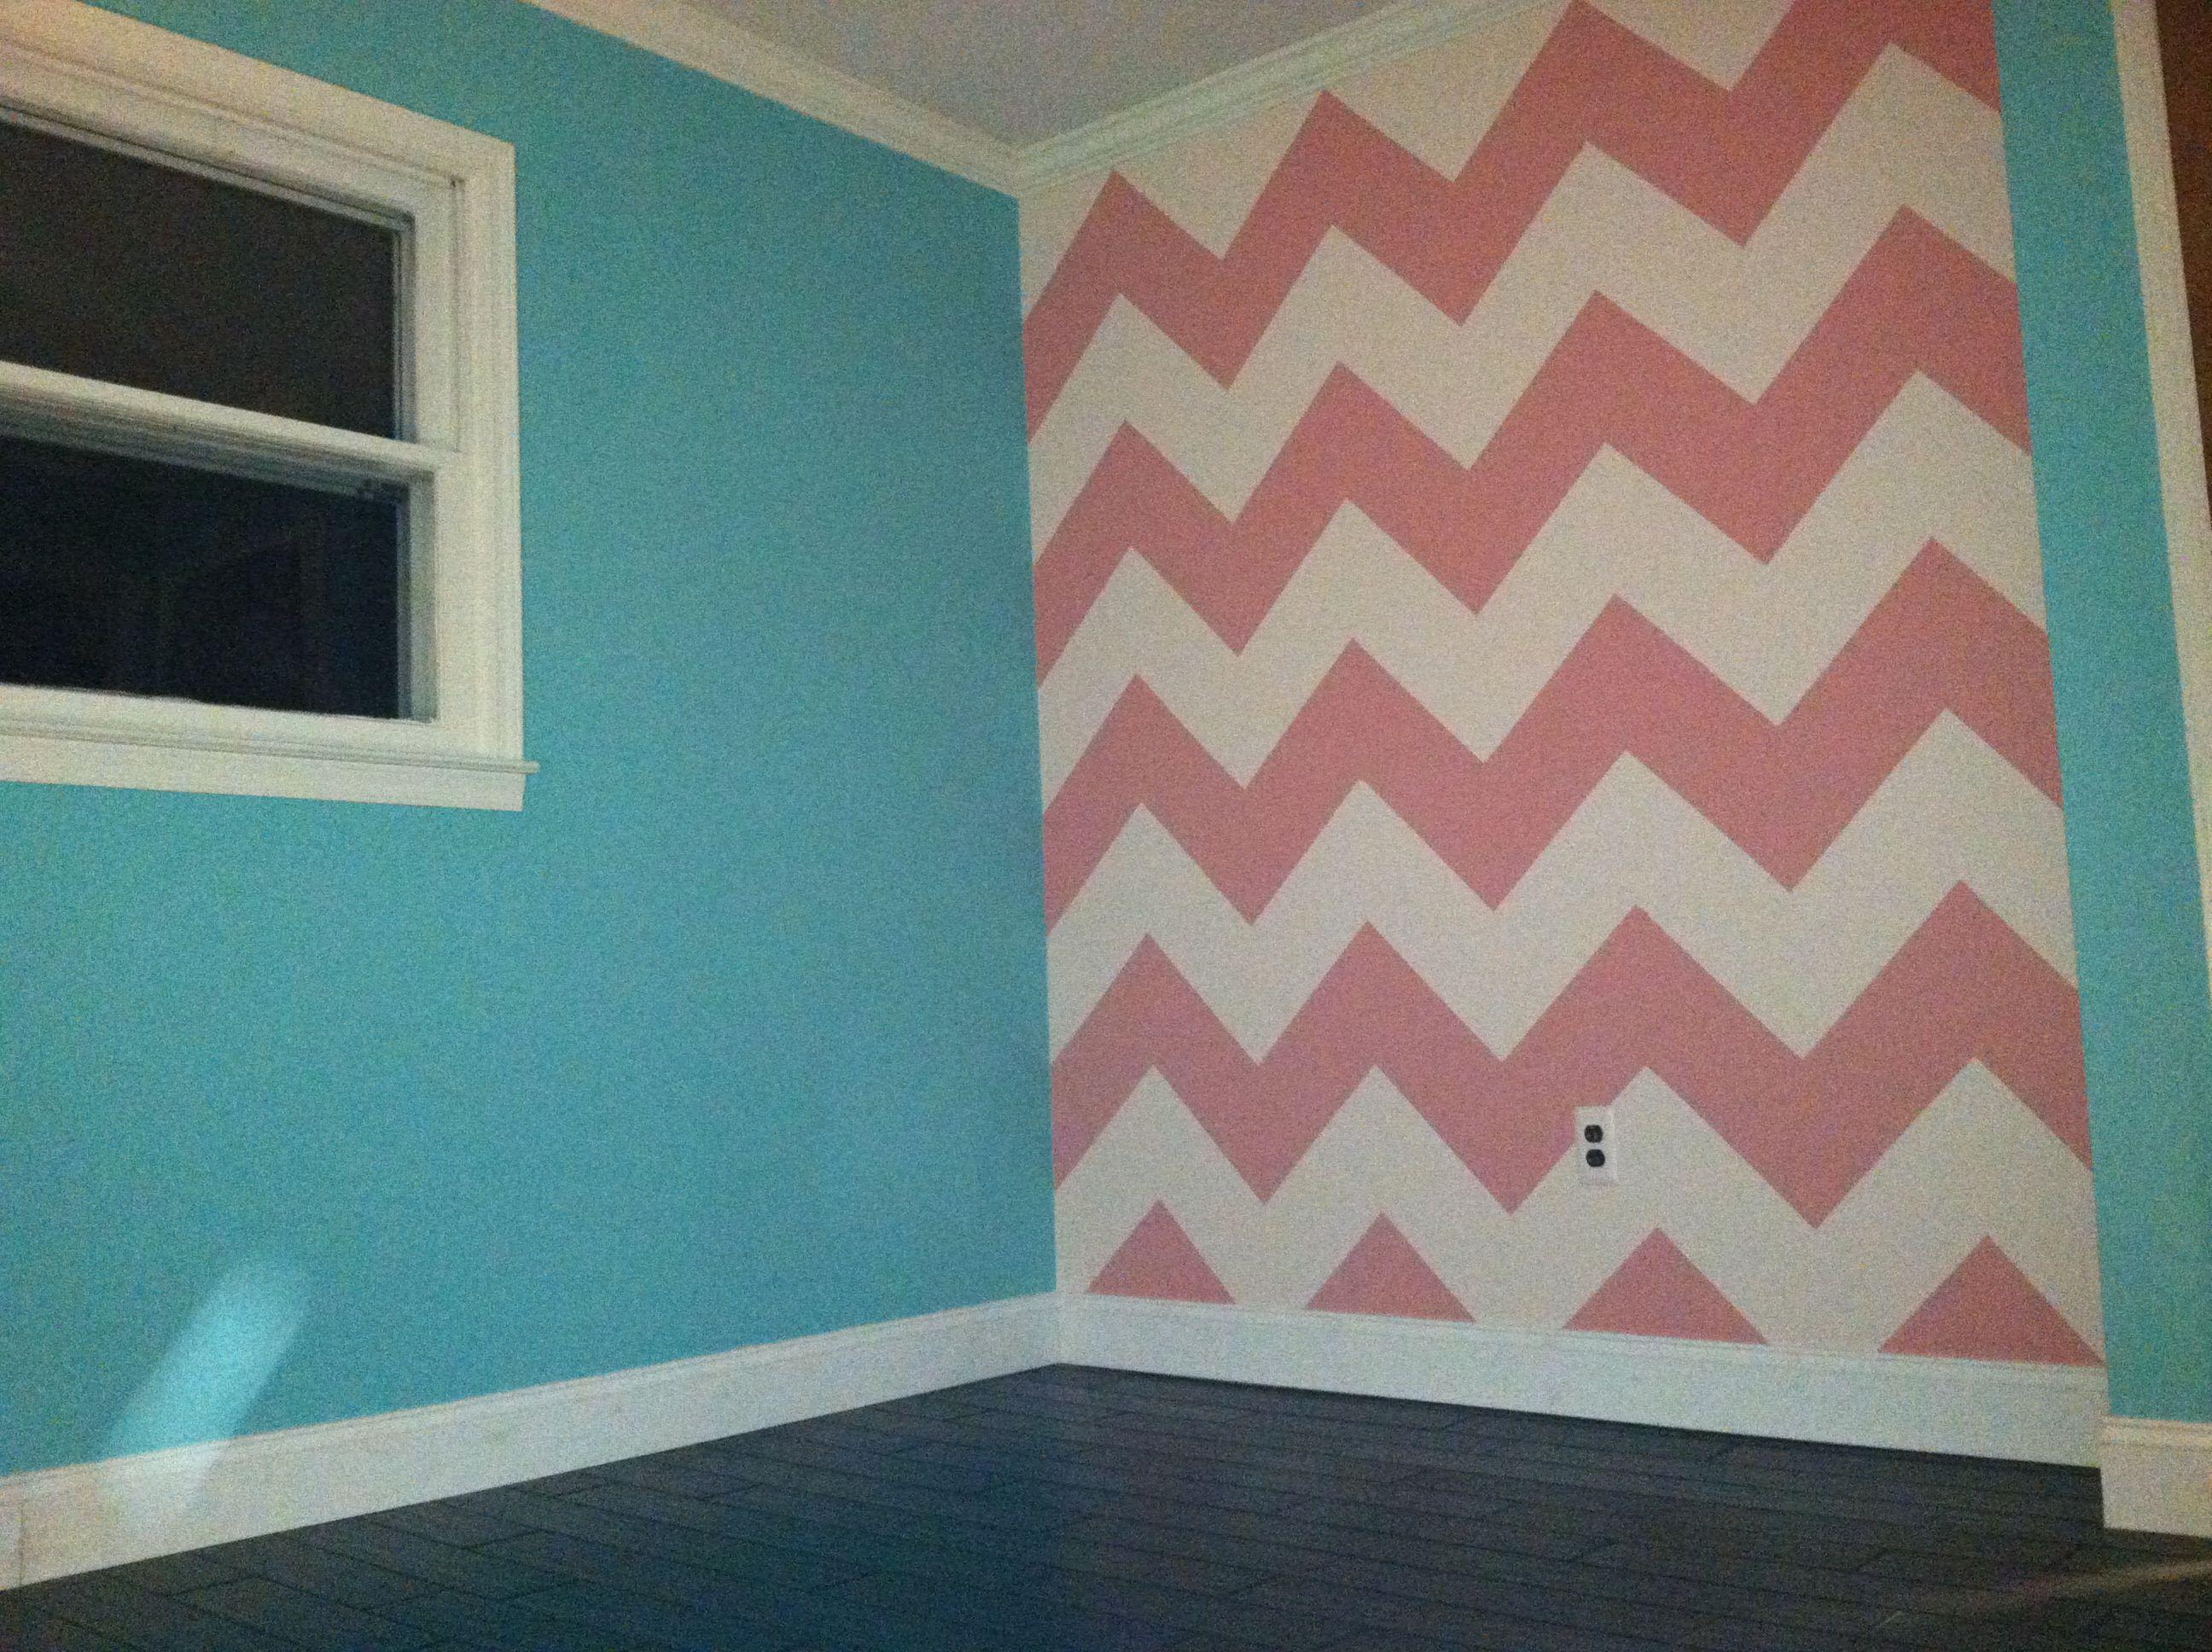 Best 25 Chevron Girls Bedrooms Ideas On Pinterest Chevron Girls Rooms Chevron Teen Rooms And